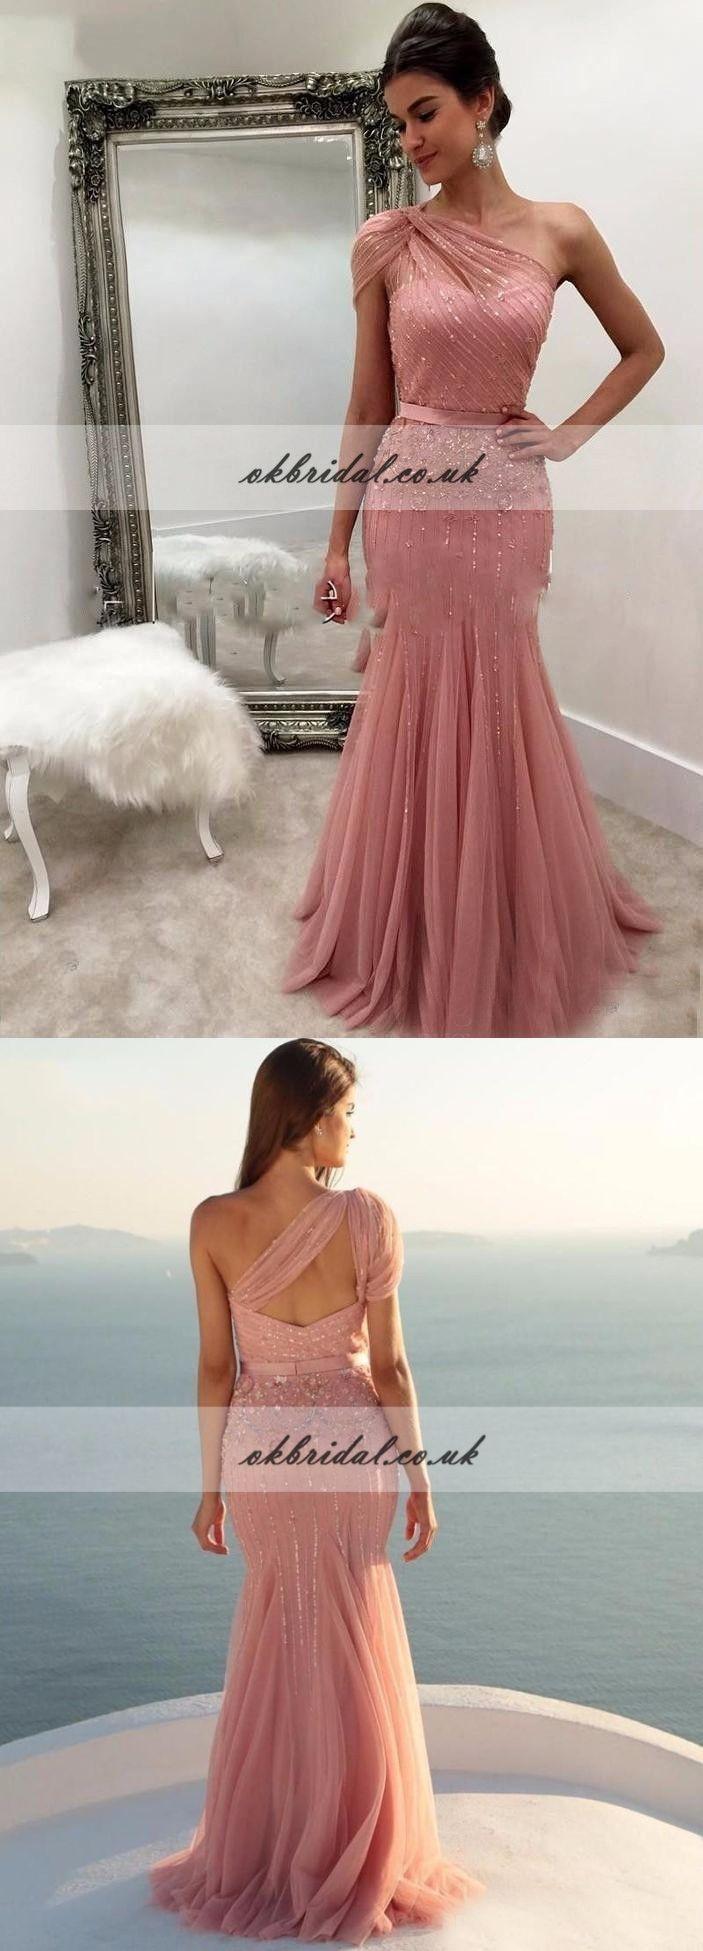 One shoulder tulle prom dress beaded prom dress mermaid prom dress